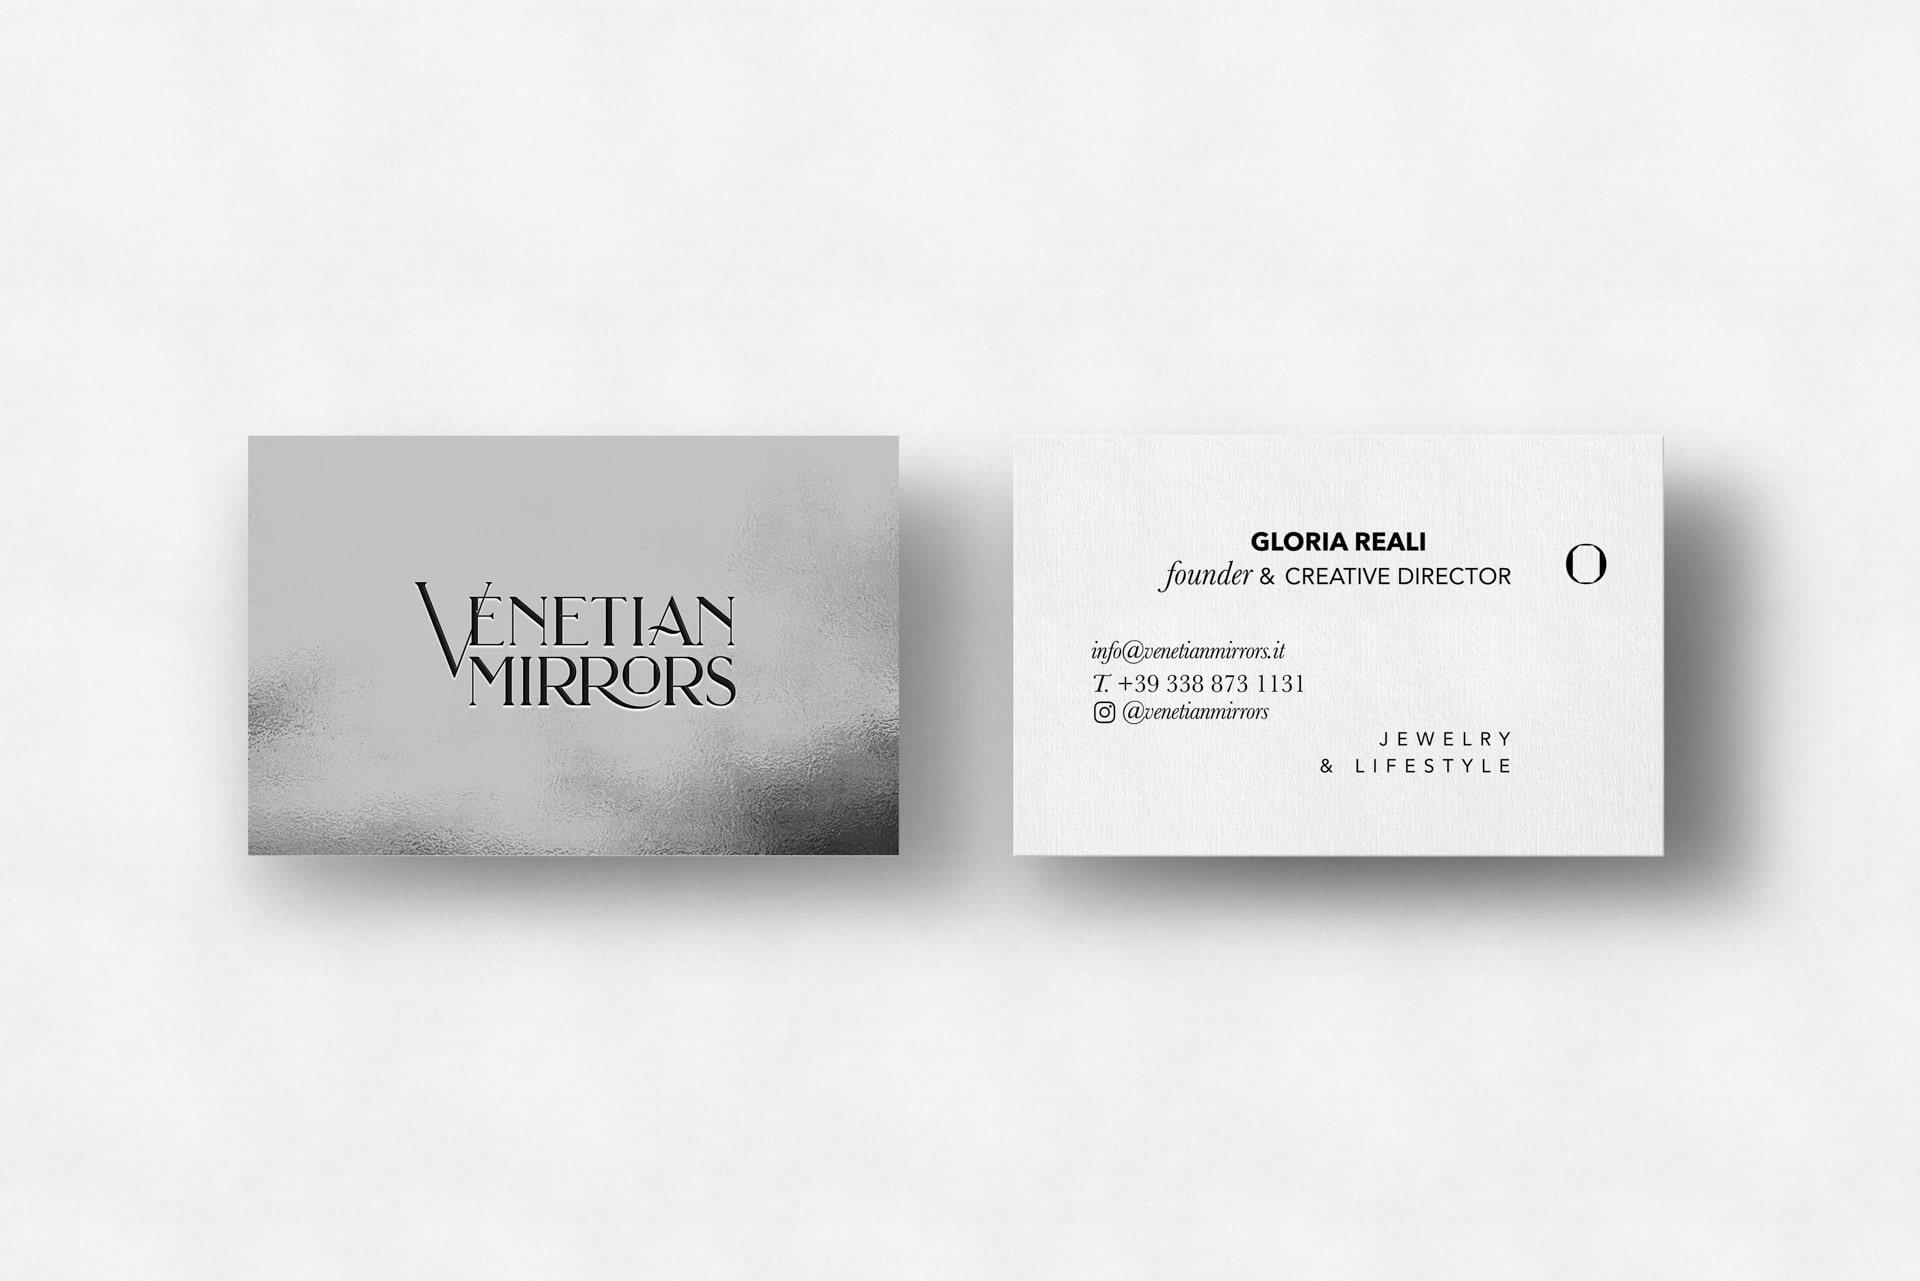 Venetian Mirrors Business Card